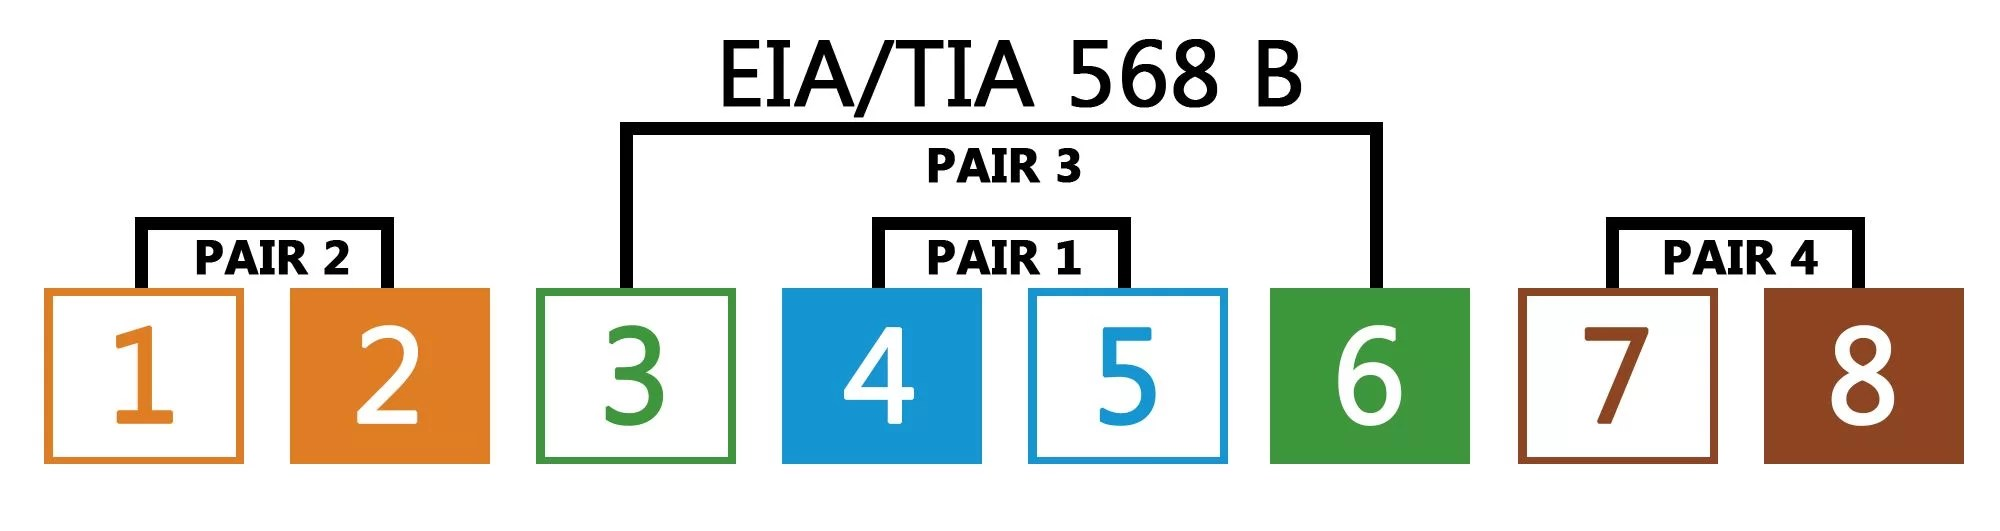 rj45_belegung_EIA_TIA_568B_pair?resize\\\\\\\=665%2C177 wiring diagram for door entry system concer biz on wiring diagram lr 63663 wiring diagram at gsmx.co